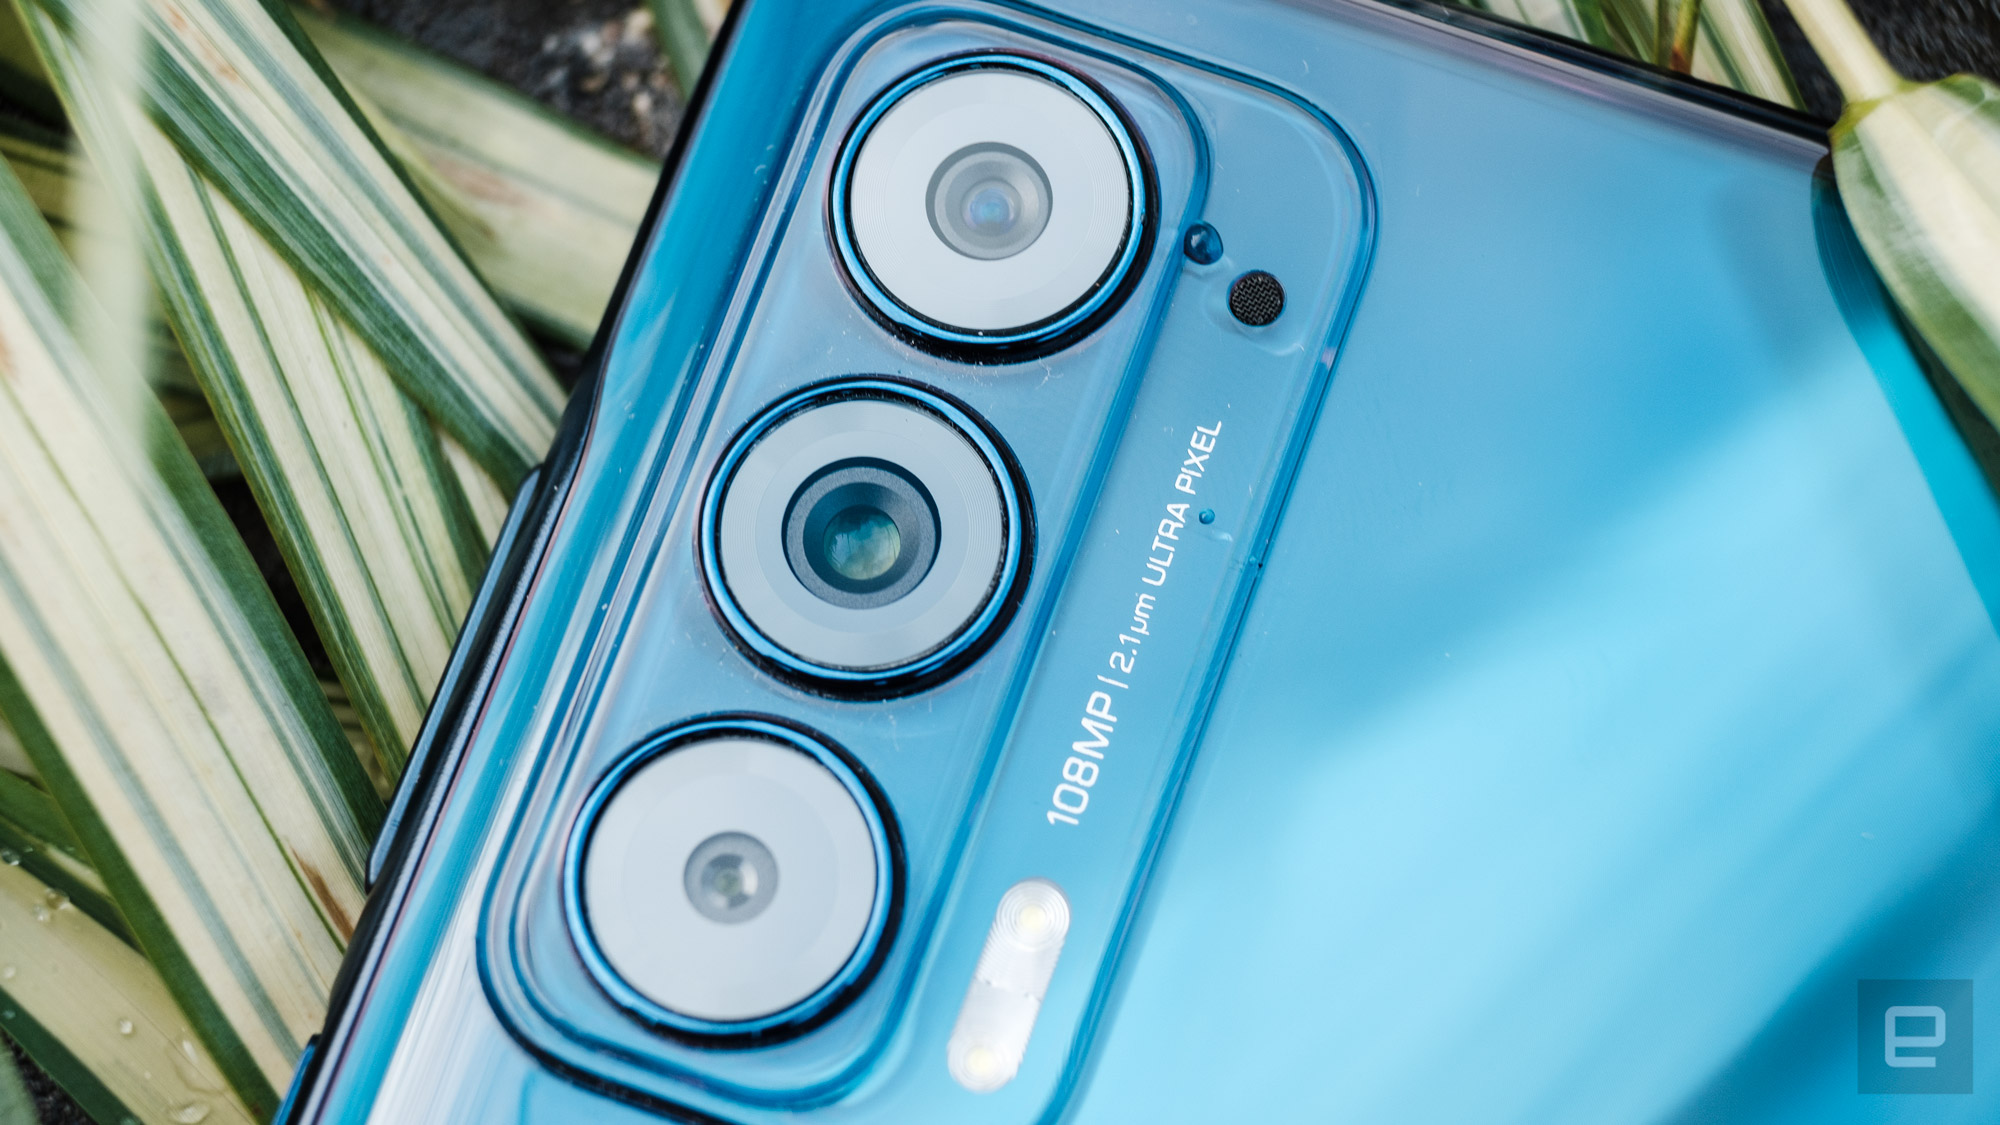 2021 Motorola Edge